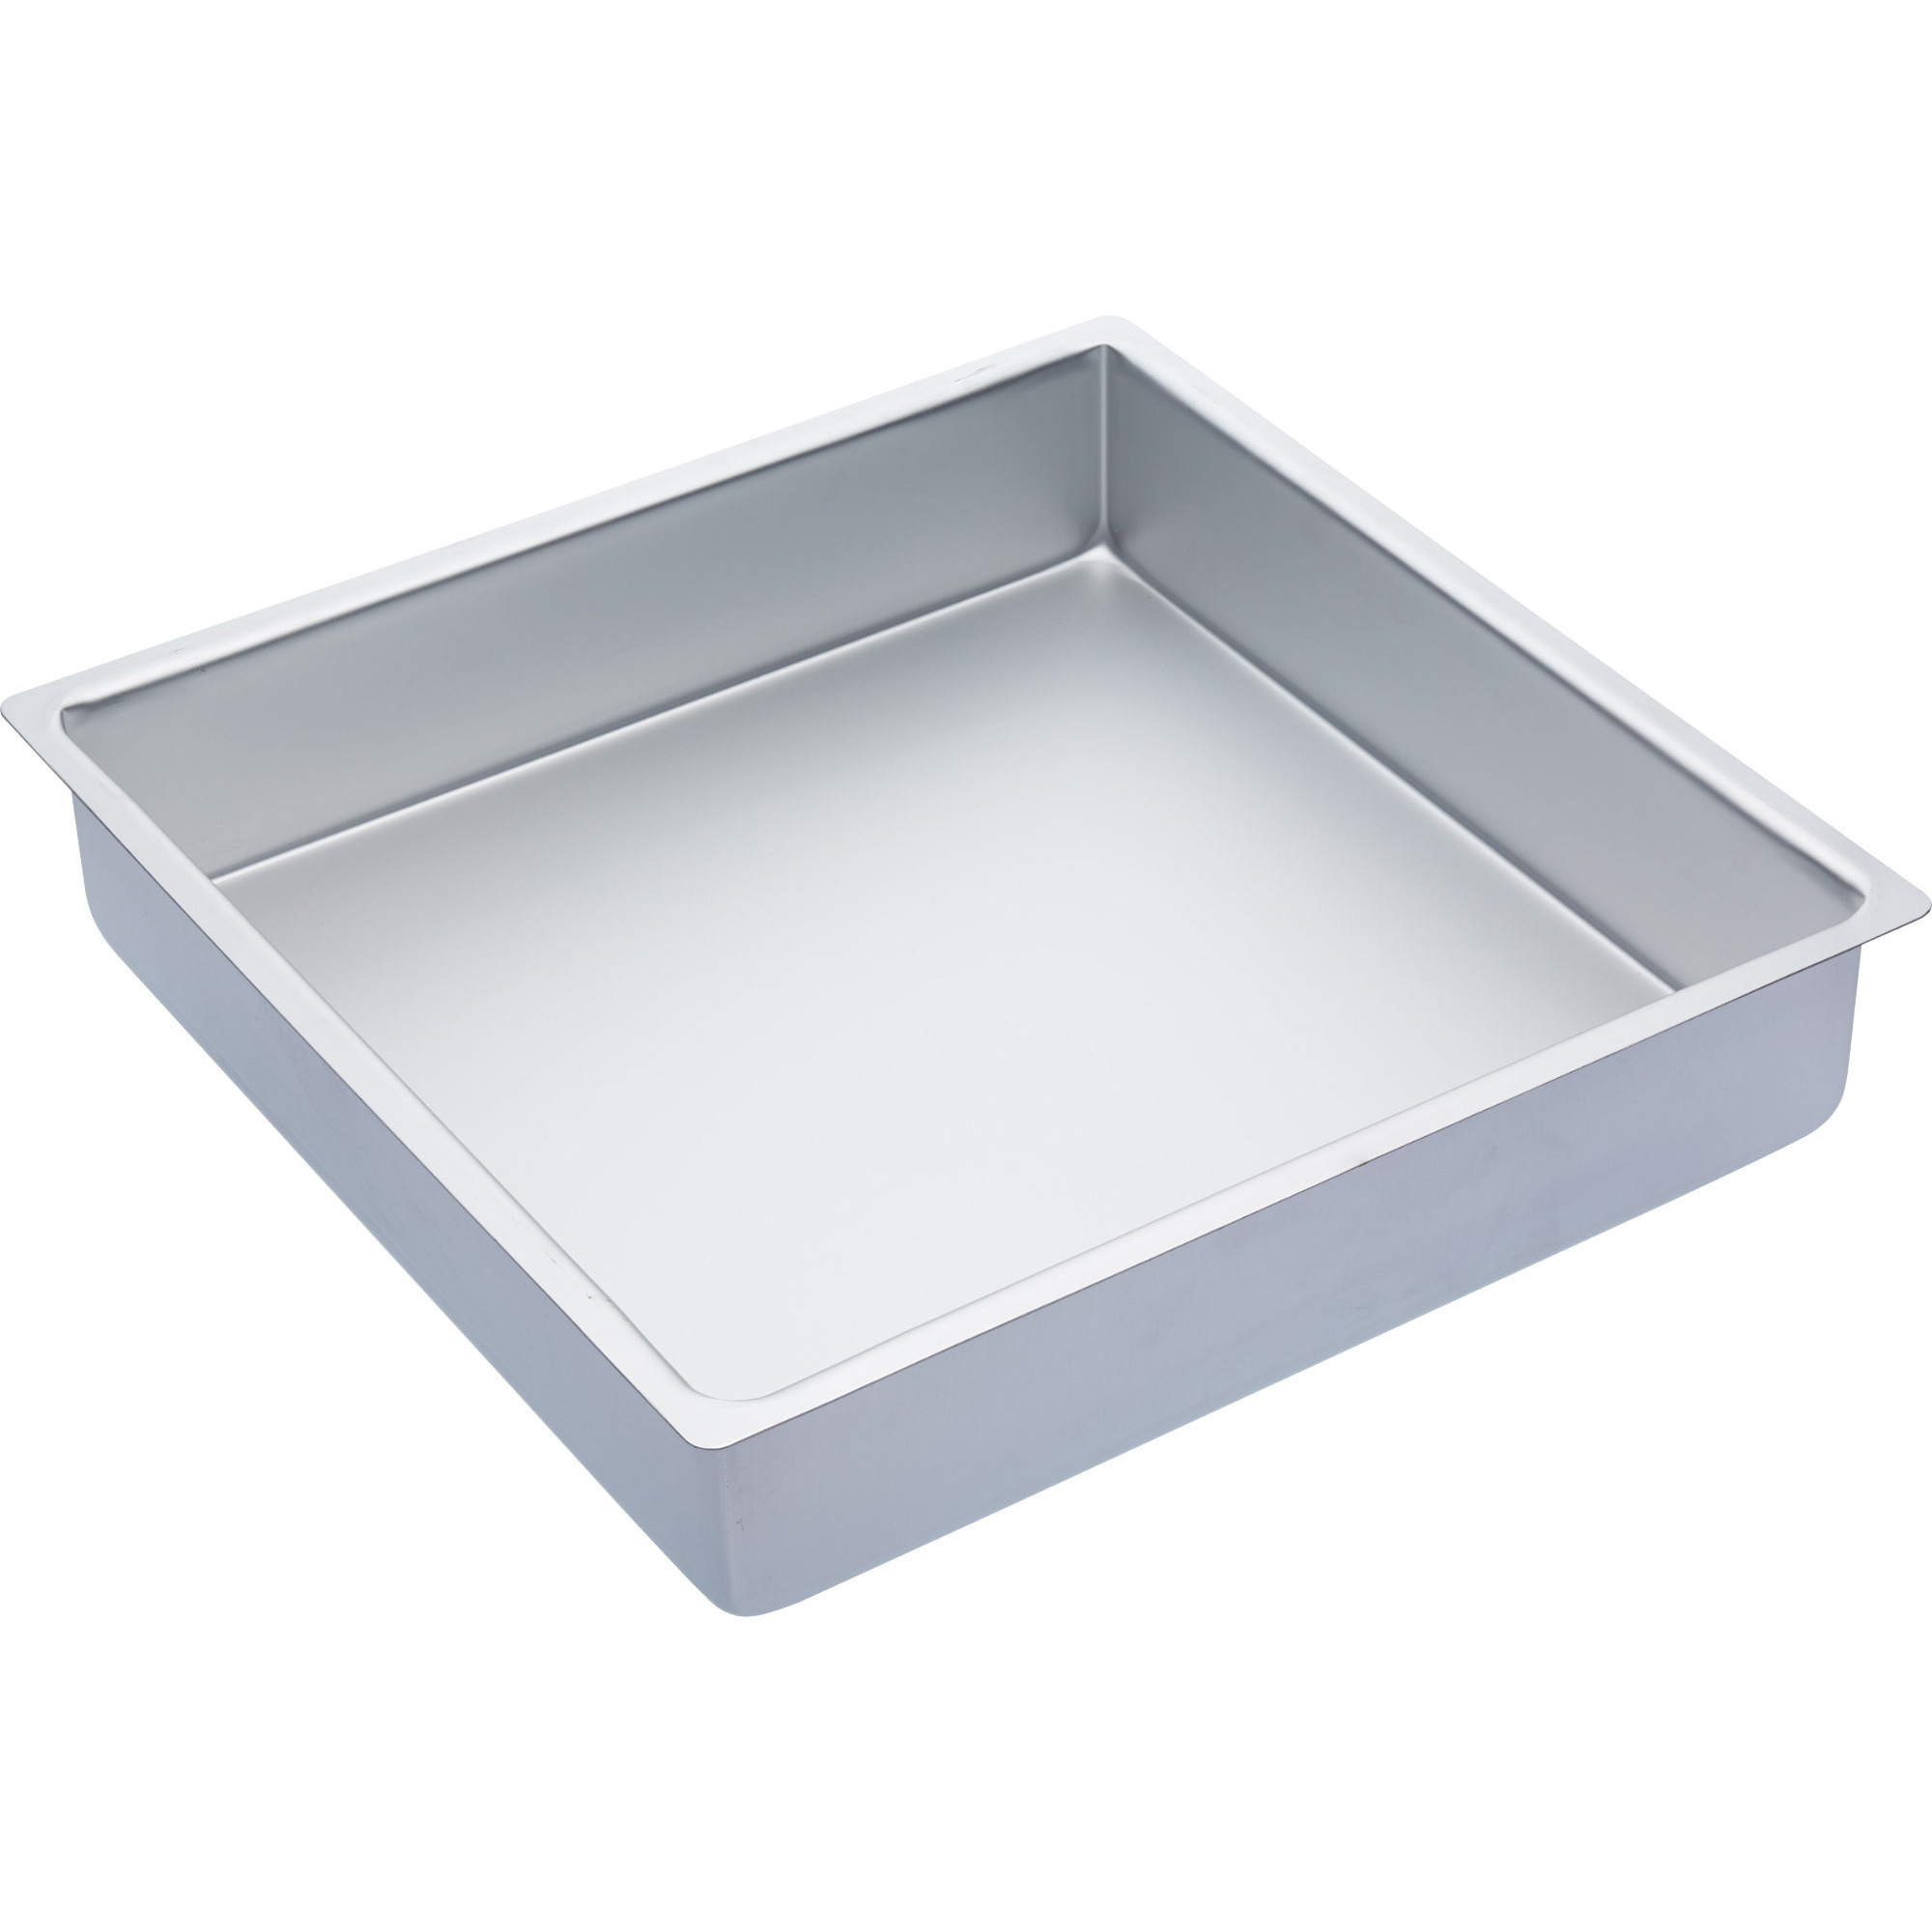 Kitchen Craft Master Class Kakform Fyrkantig Silver 355x355x7.5cm